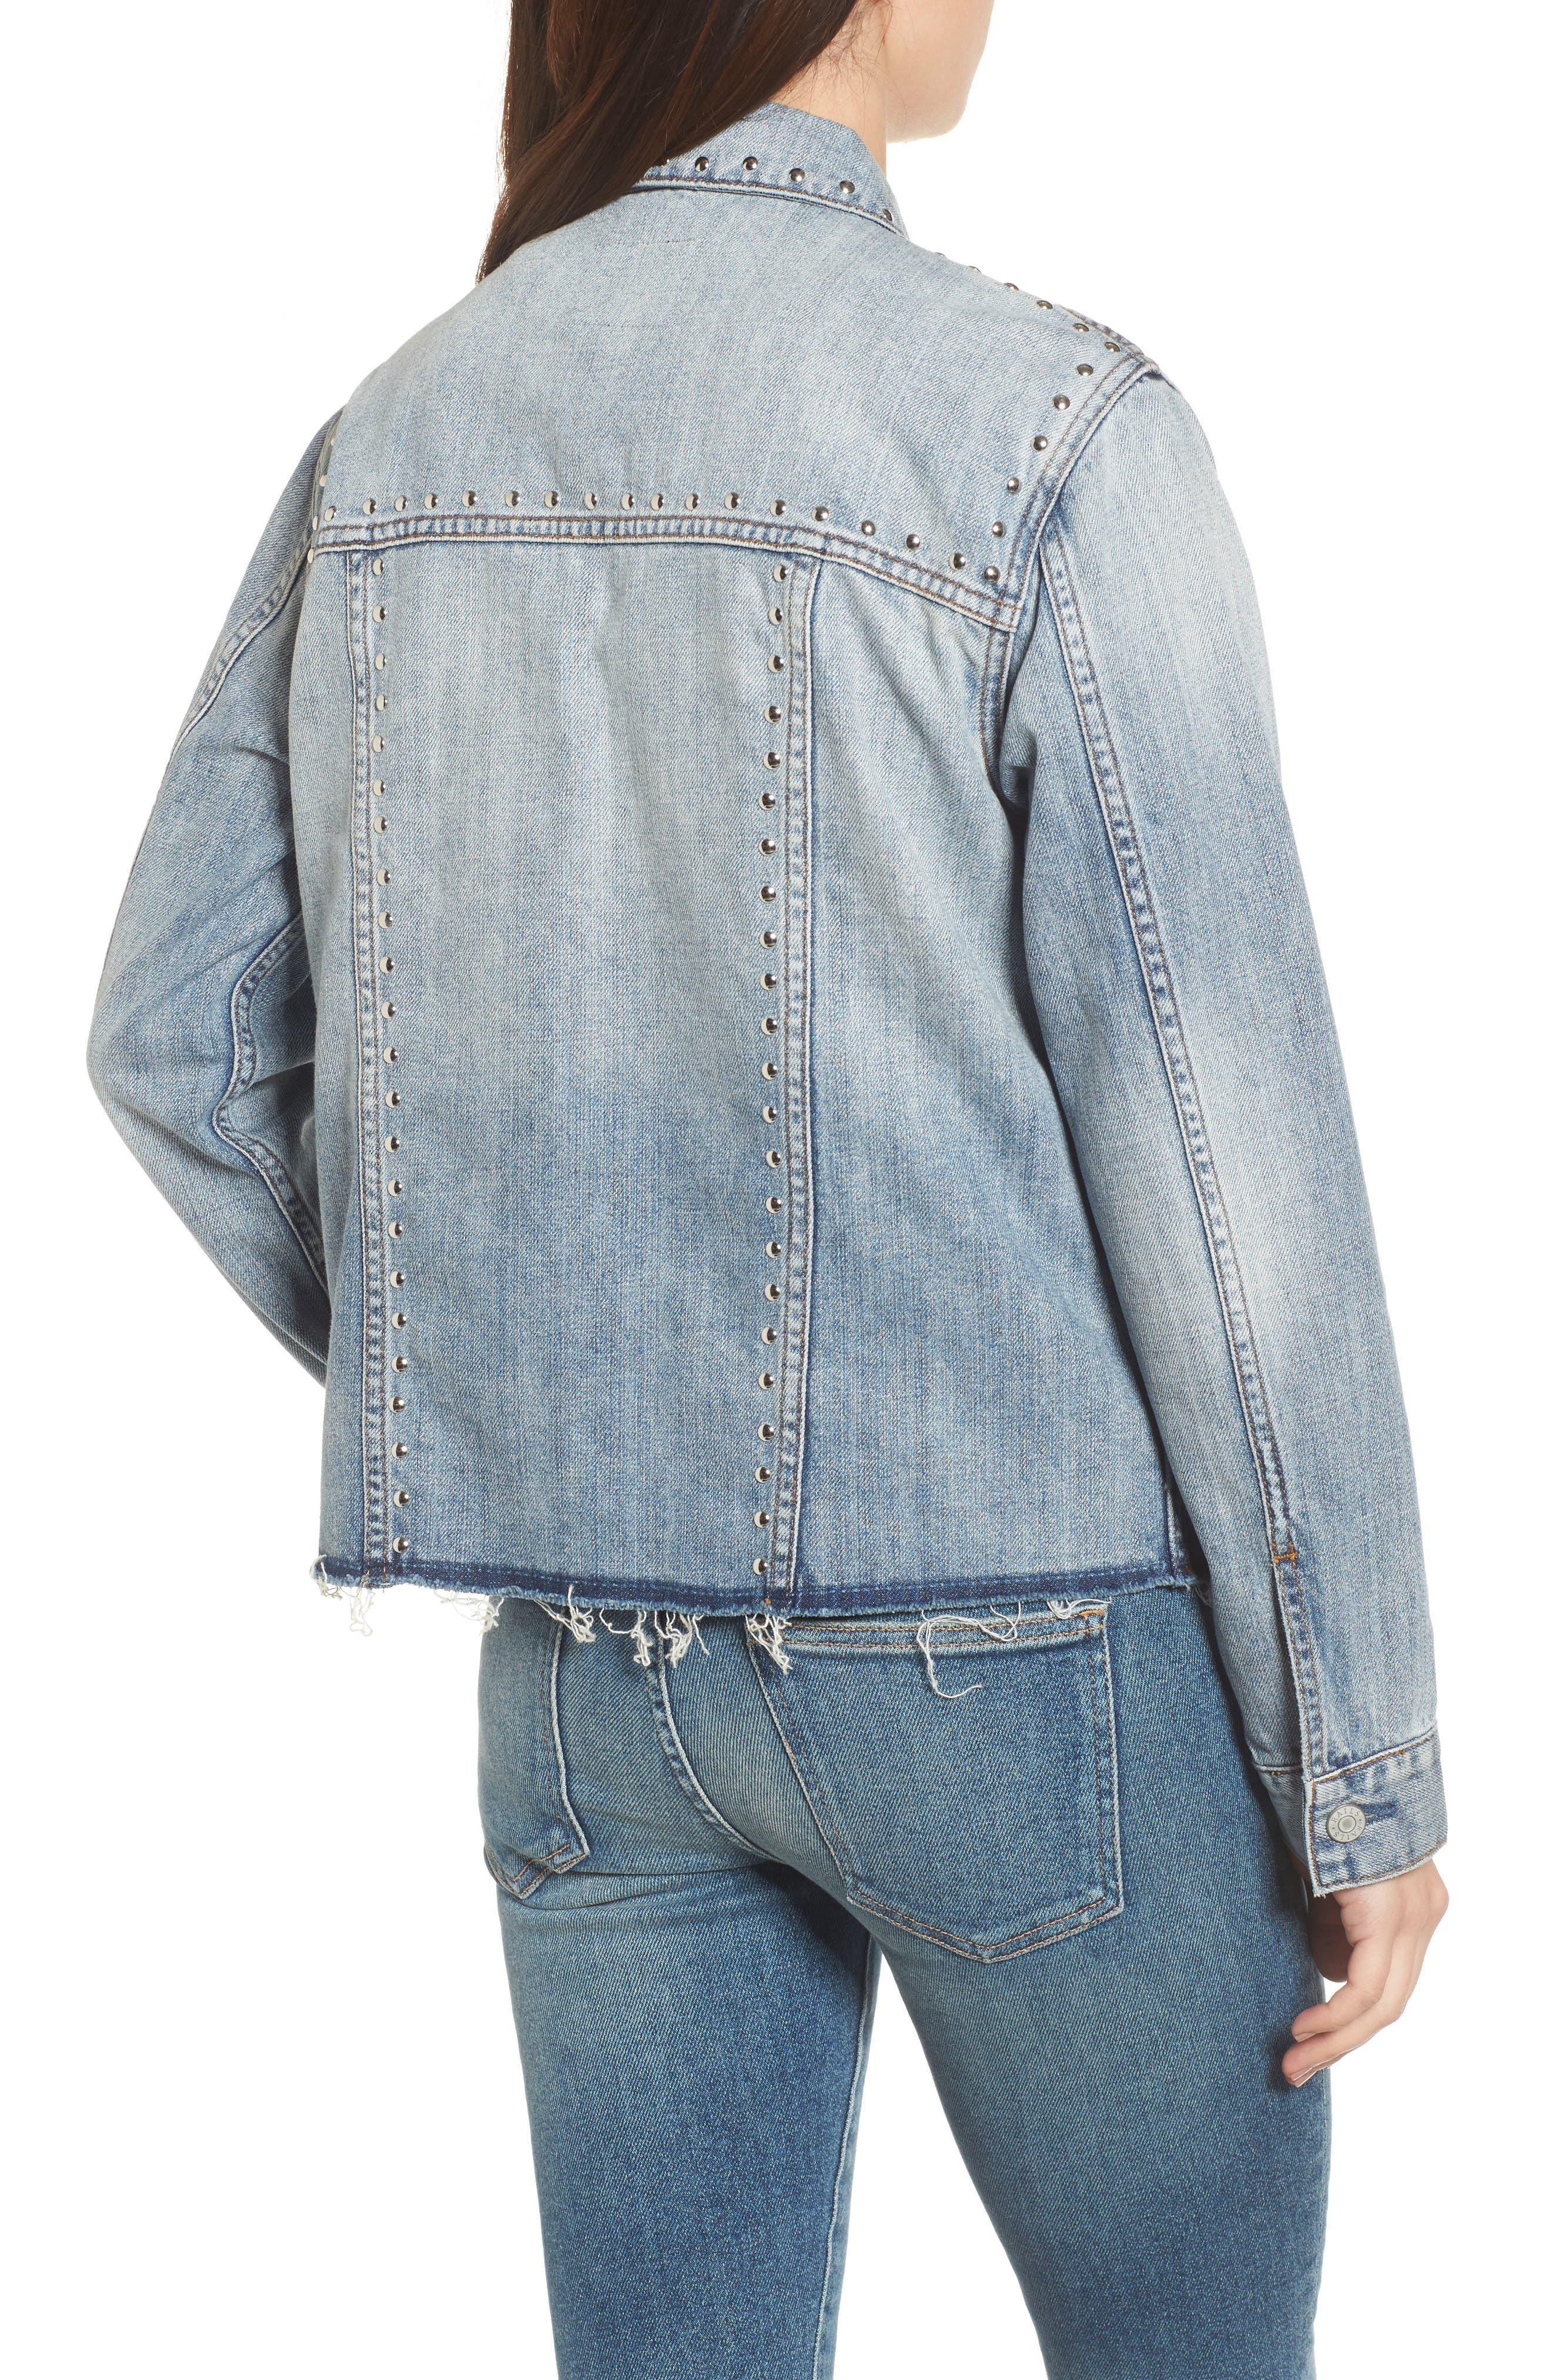 Knox Studded Denim Jacket,                             Alternate thumbnail 2, color,